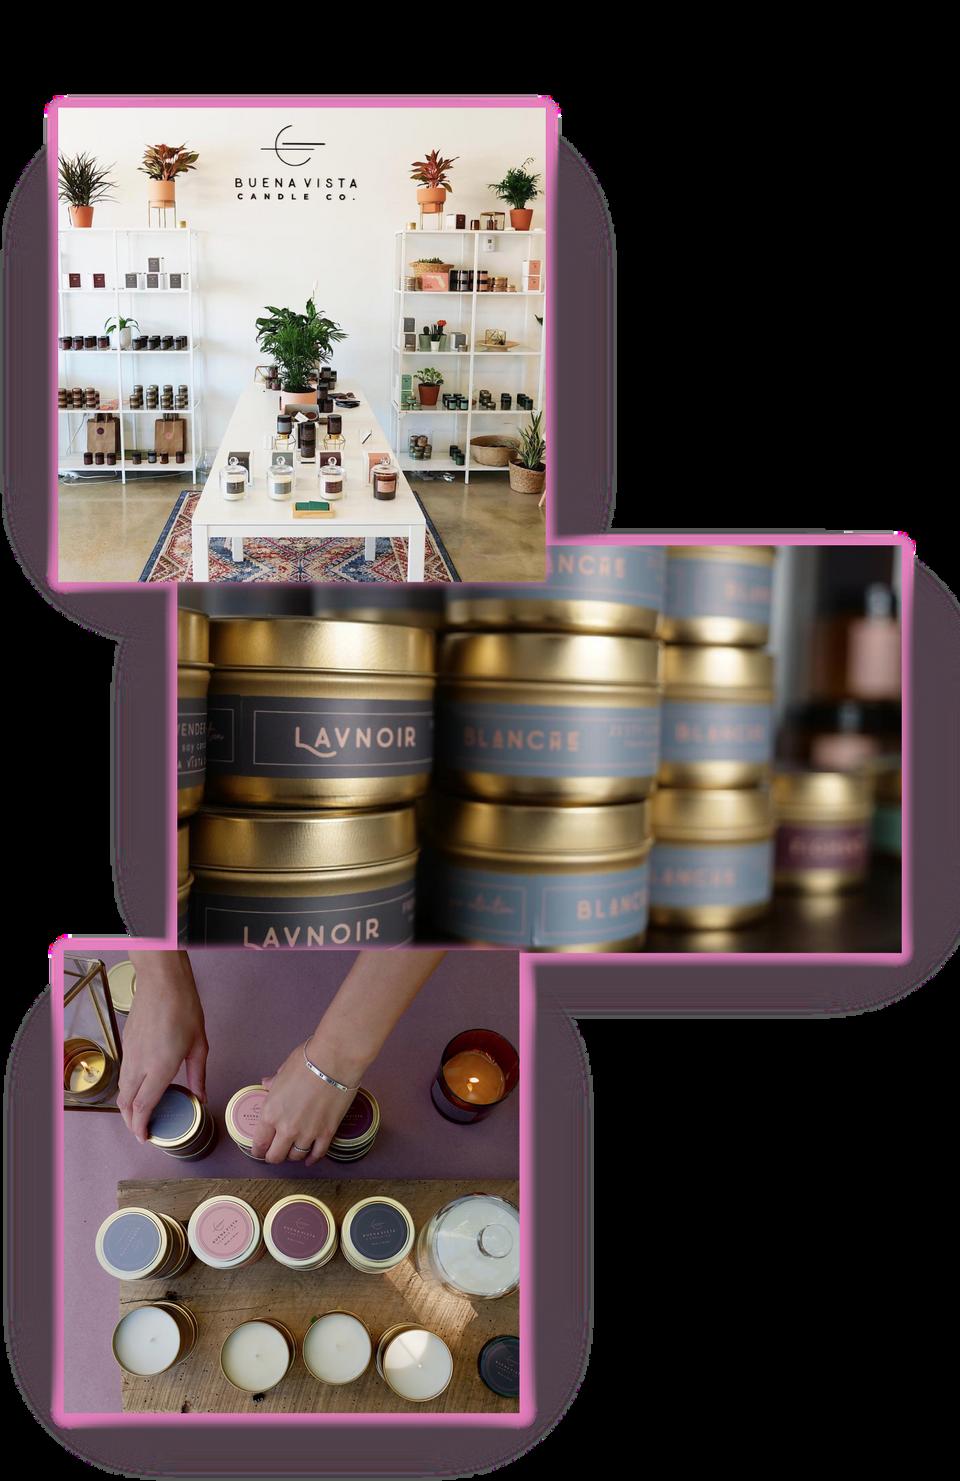 Packaging/Labels